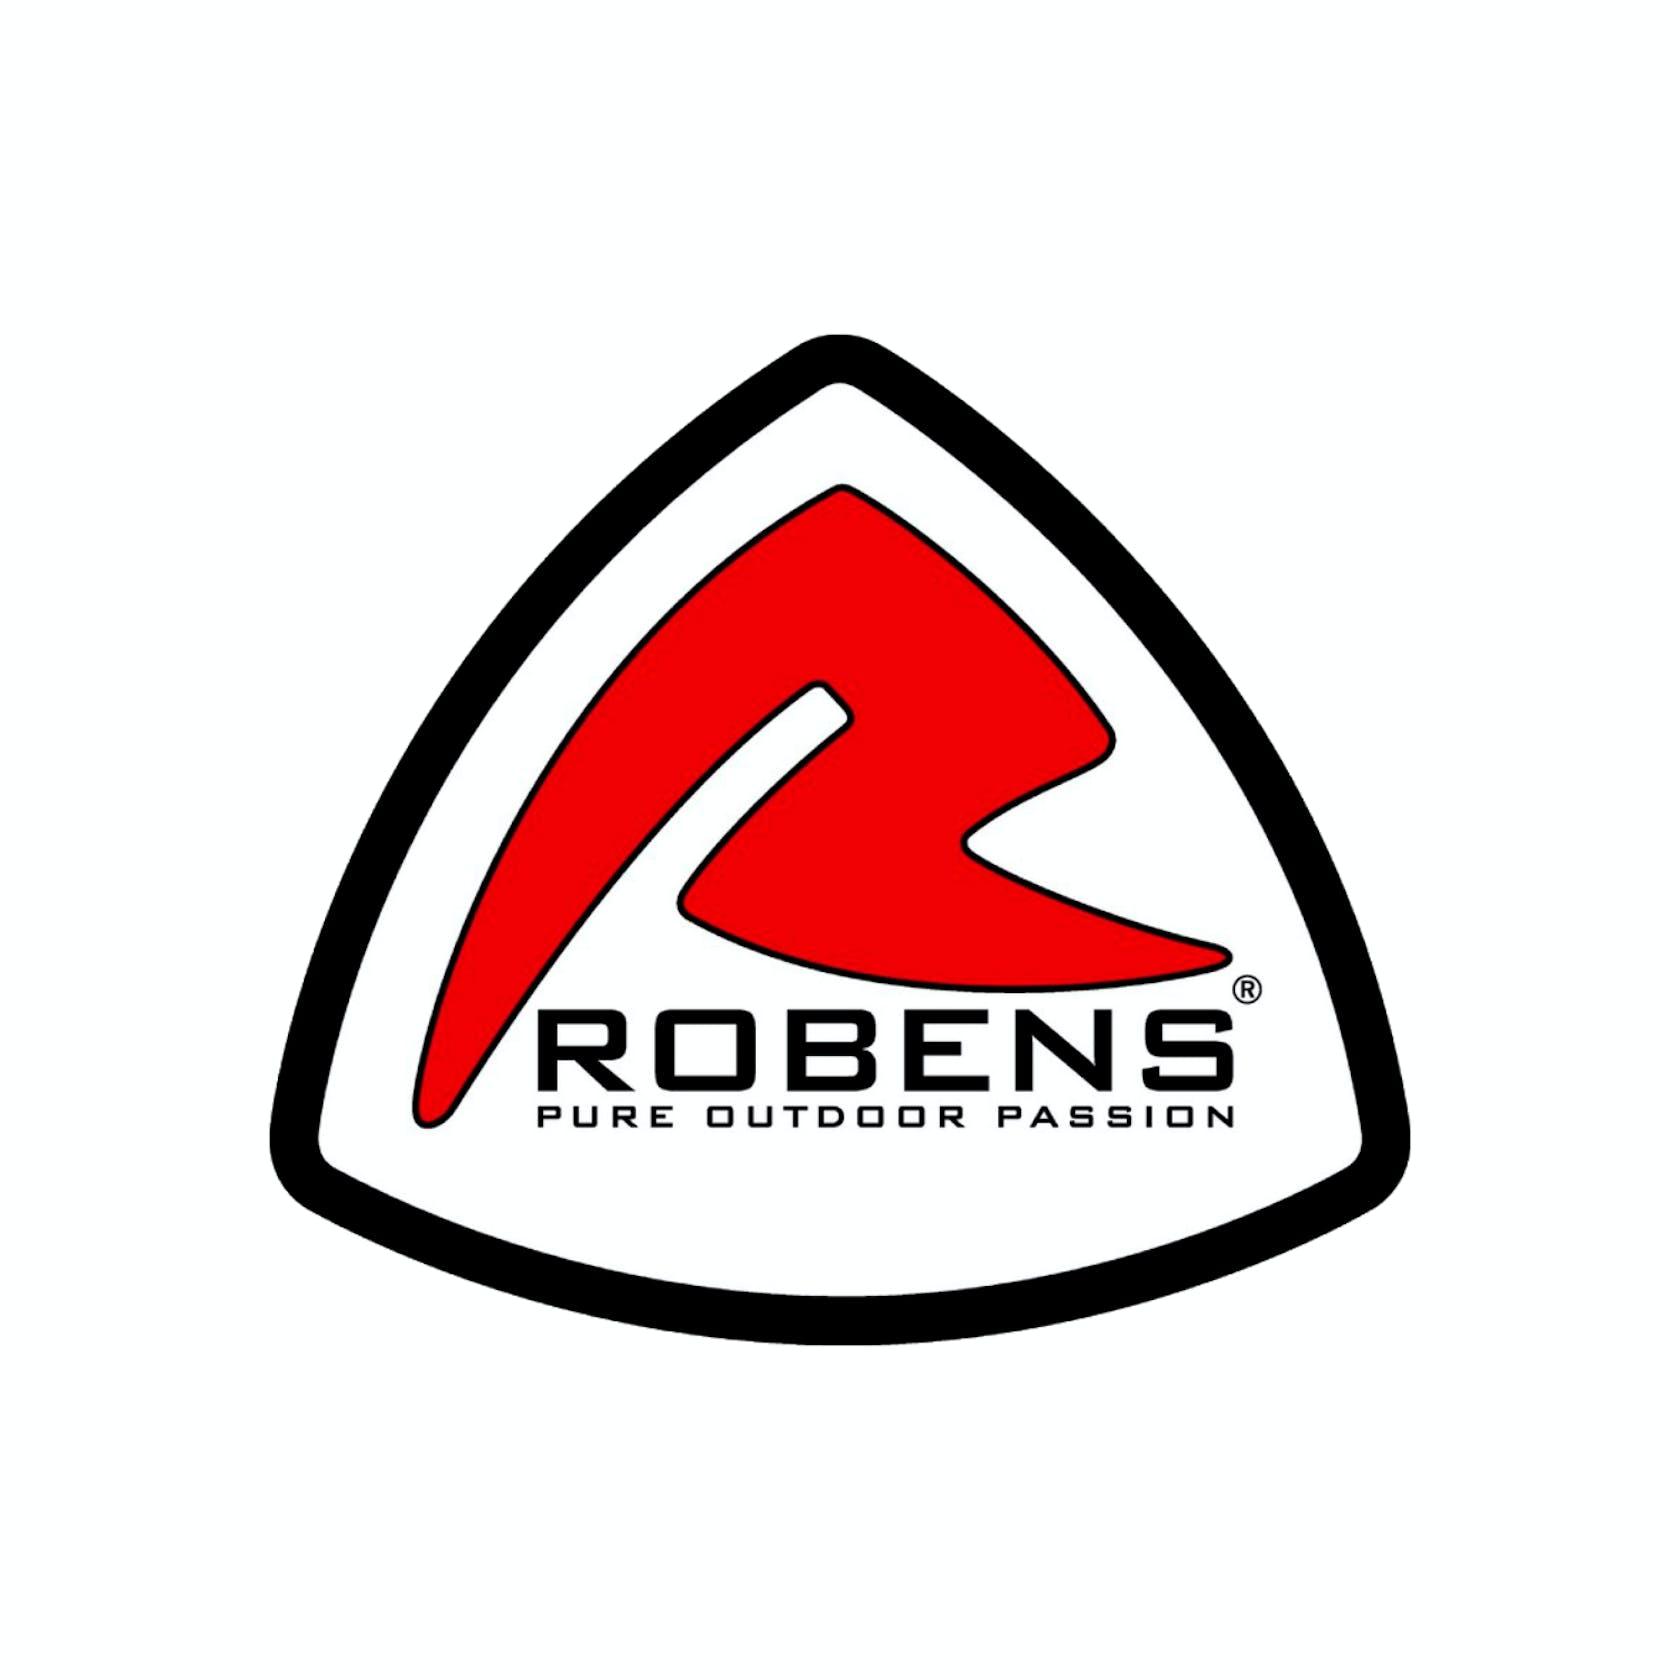 Robens onlineshop